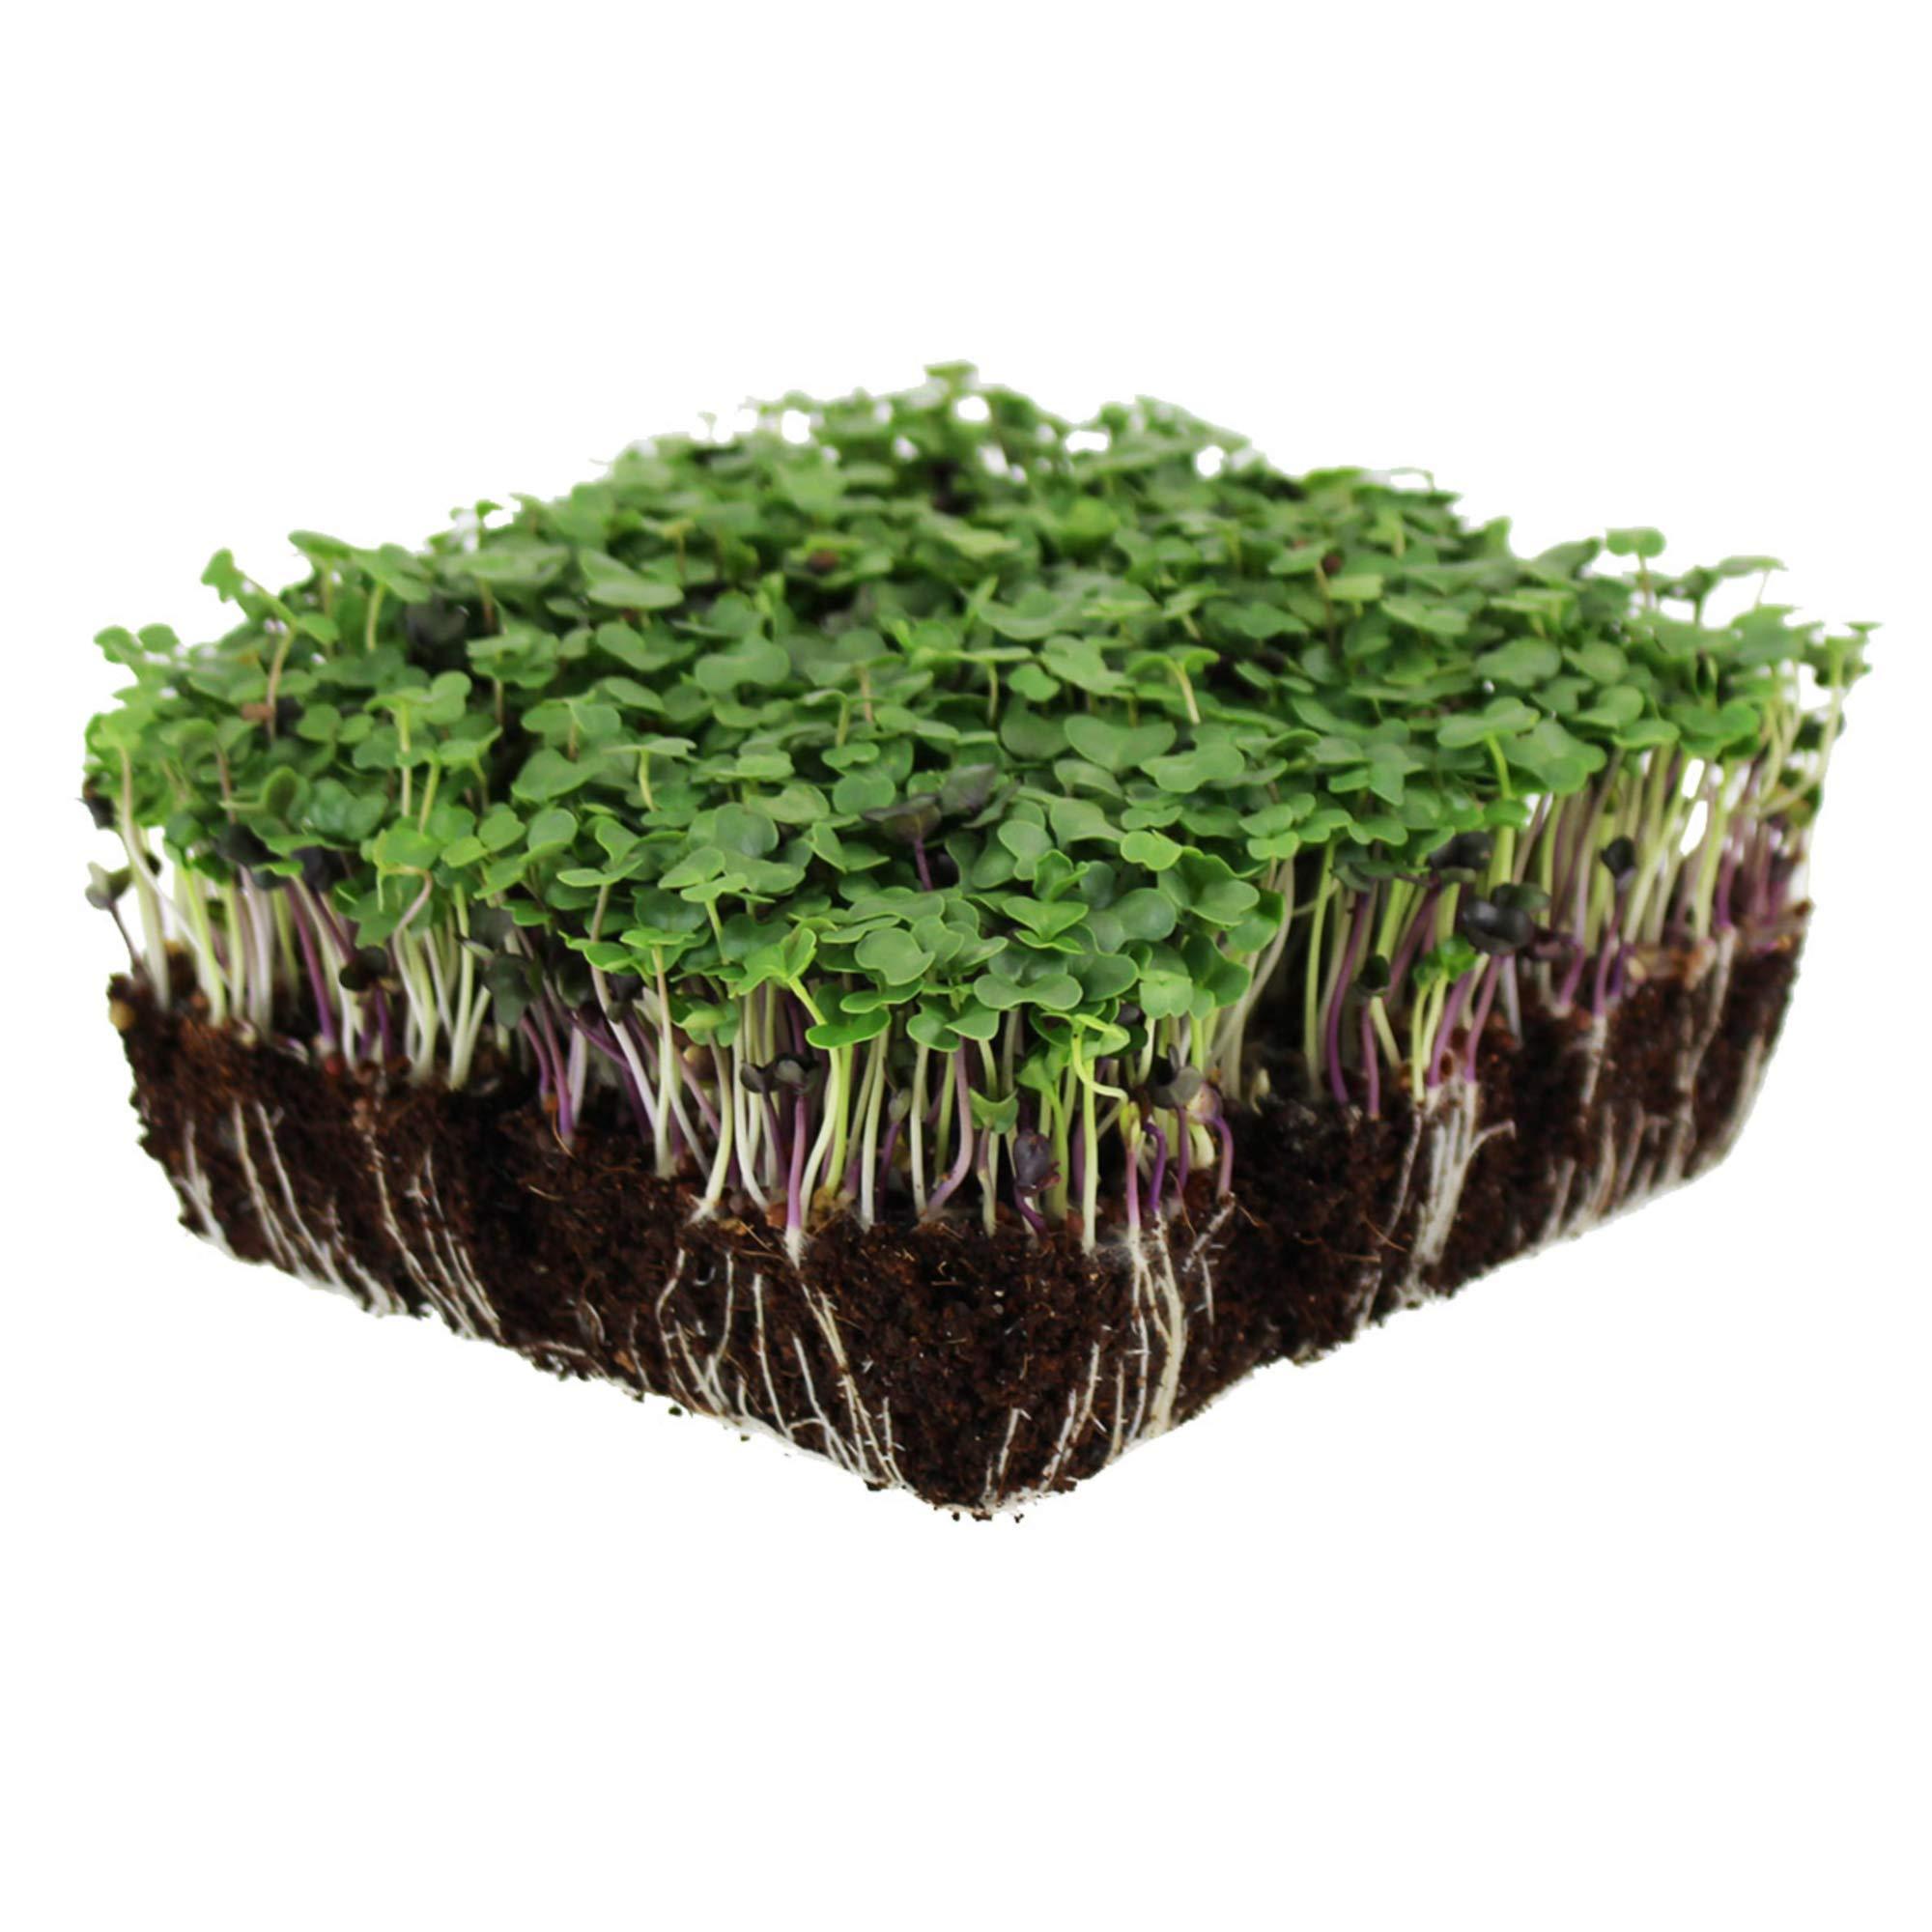 Basic Salad Mix Microgreens Seeds | Non-GMO Micro Green Seed Blend | Broccoli, Kale, Kohlrabi, Cabbage, Arugula, More (1 Pound)